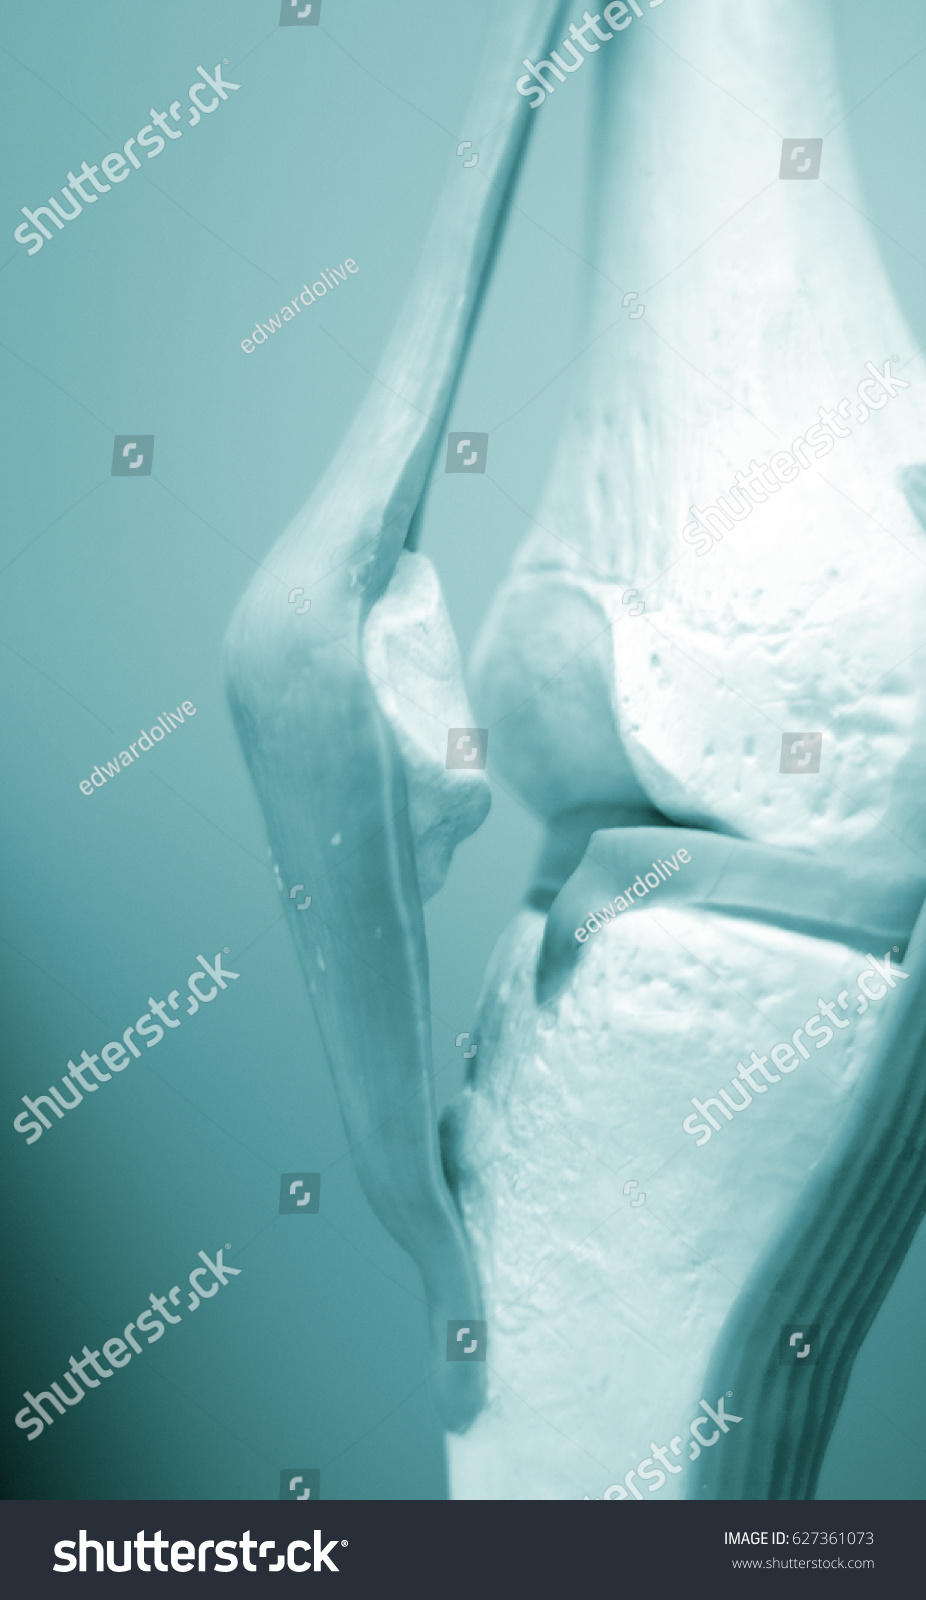 Knee Meniscus Medical Study Student Anatomy Stock Photo (100% Legal ...